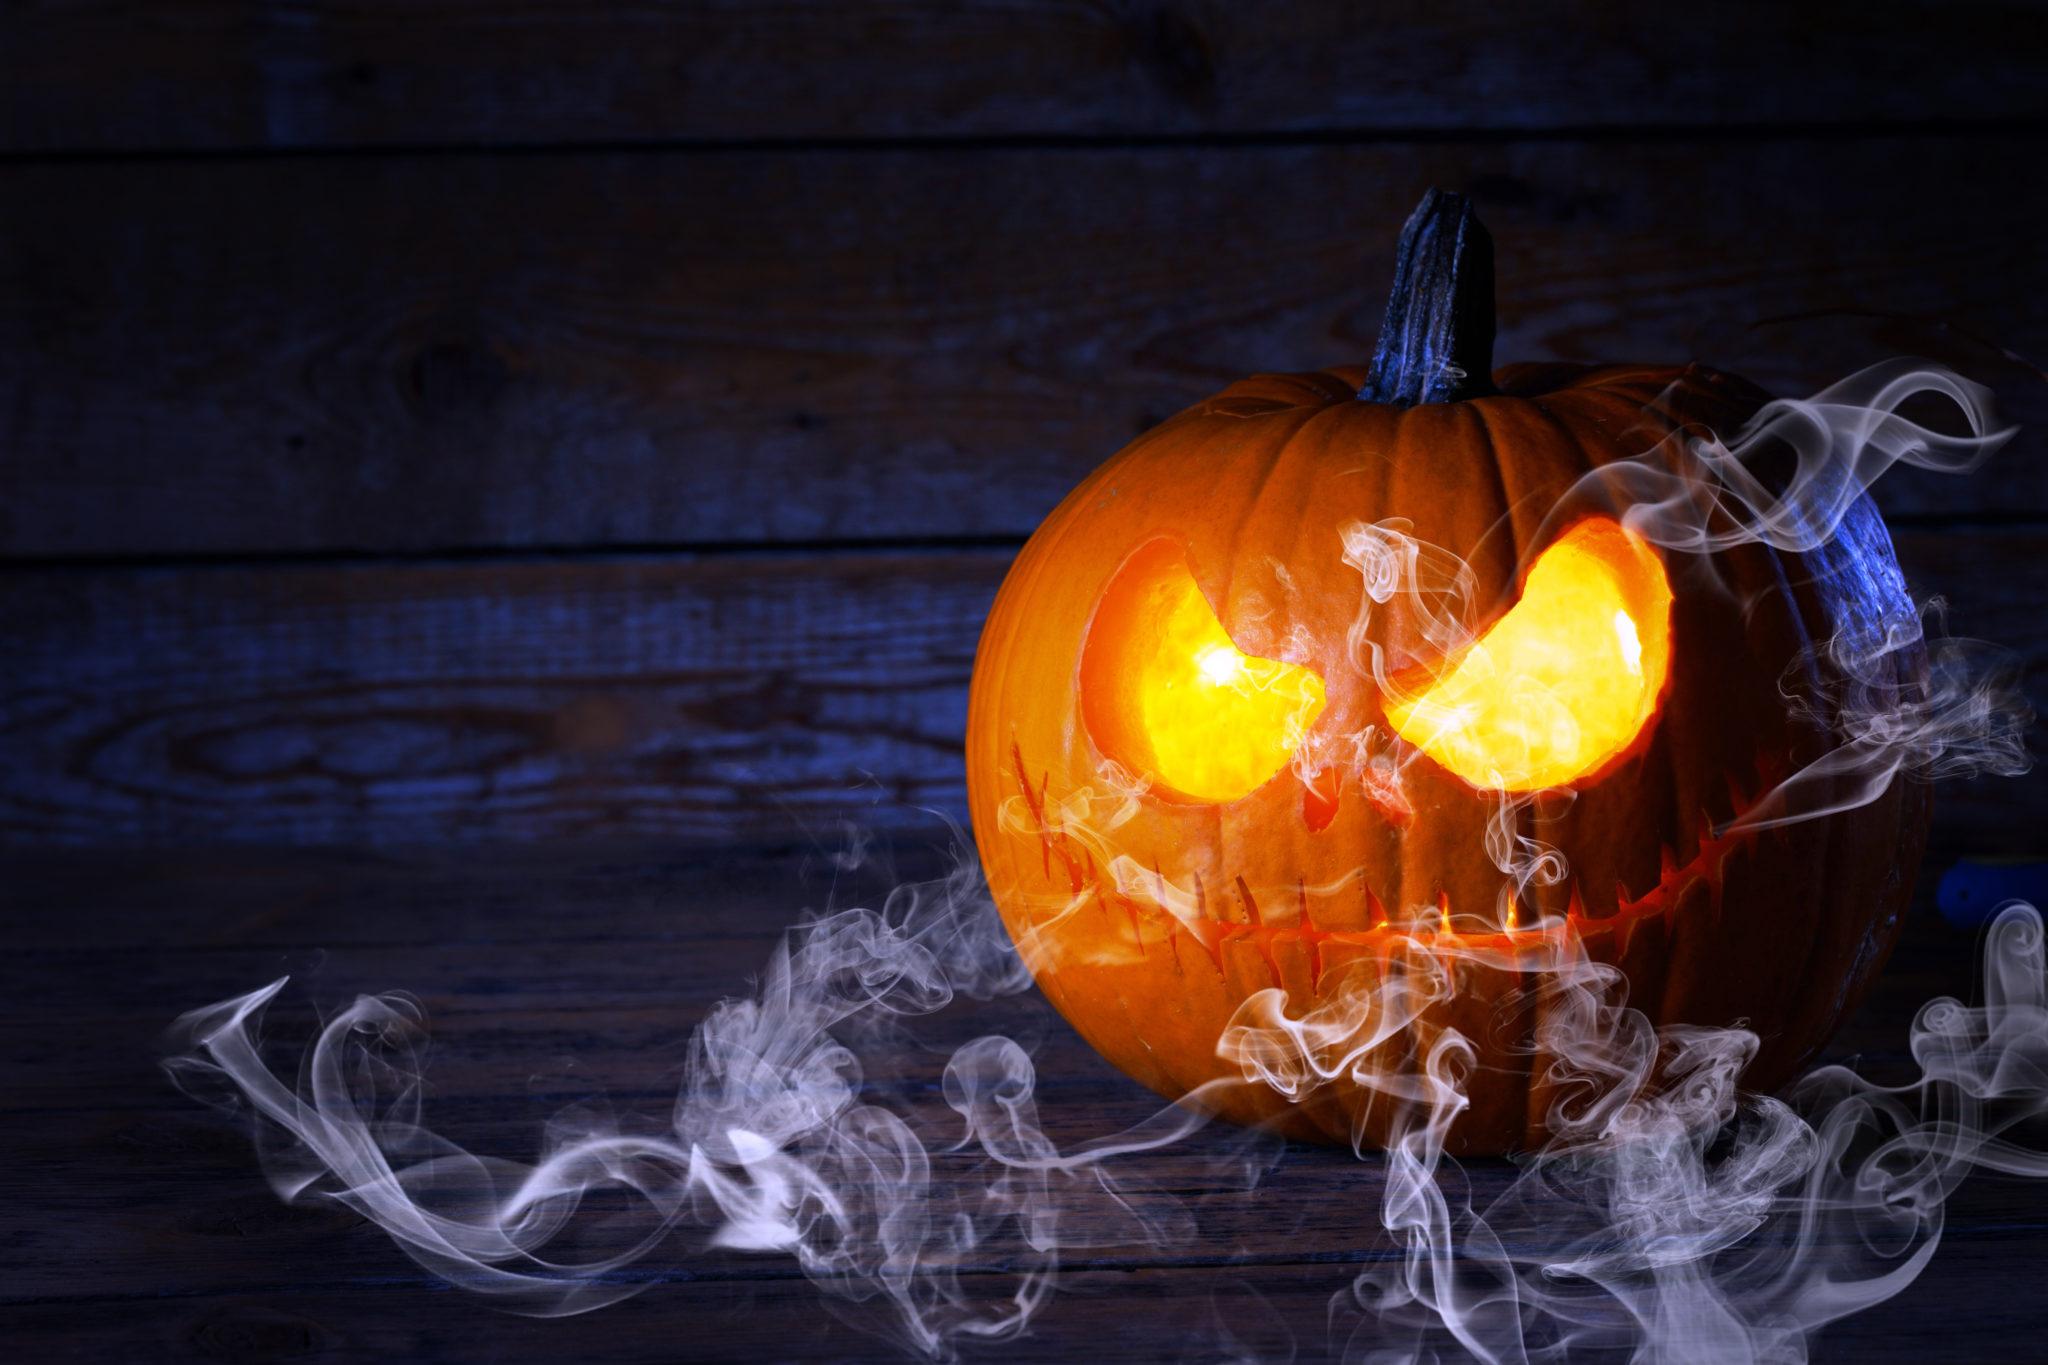 Scary Jack o Lantern at dark night